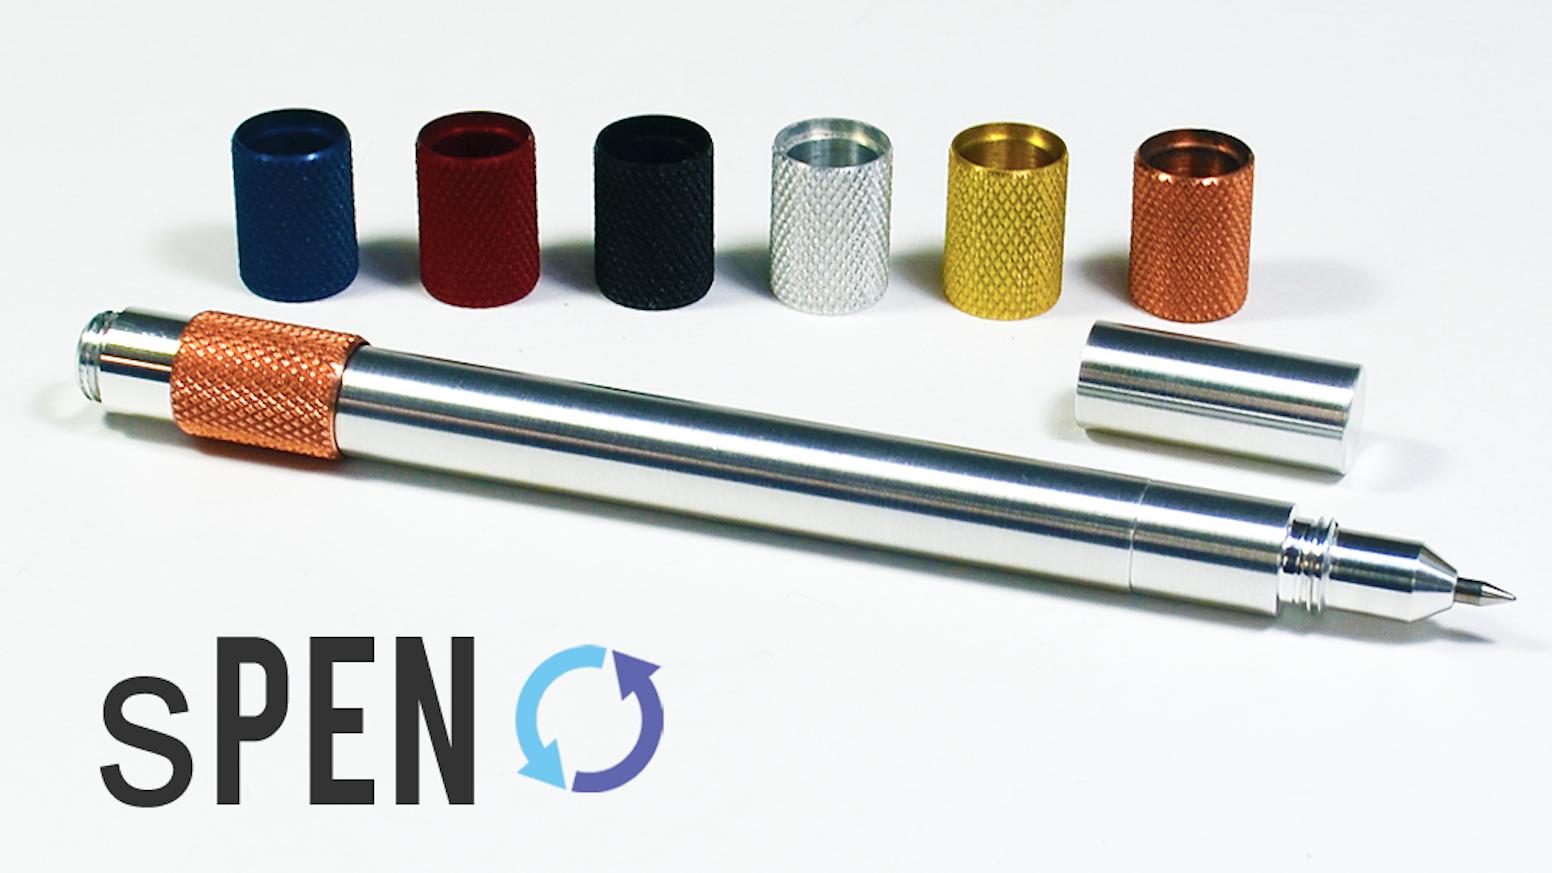 A Fidgeter with a function! The 'sPEN' is a pen that integrates a fun fidget spinner!